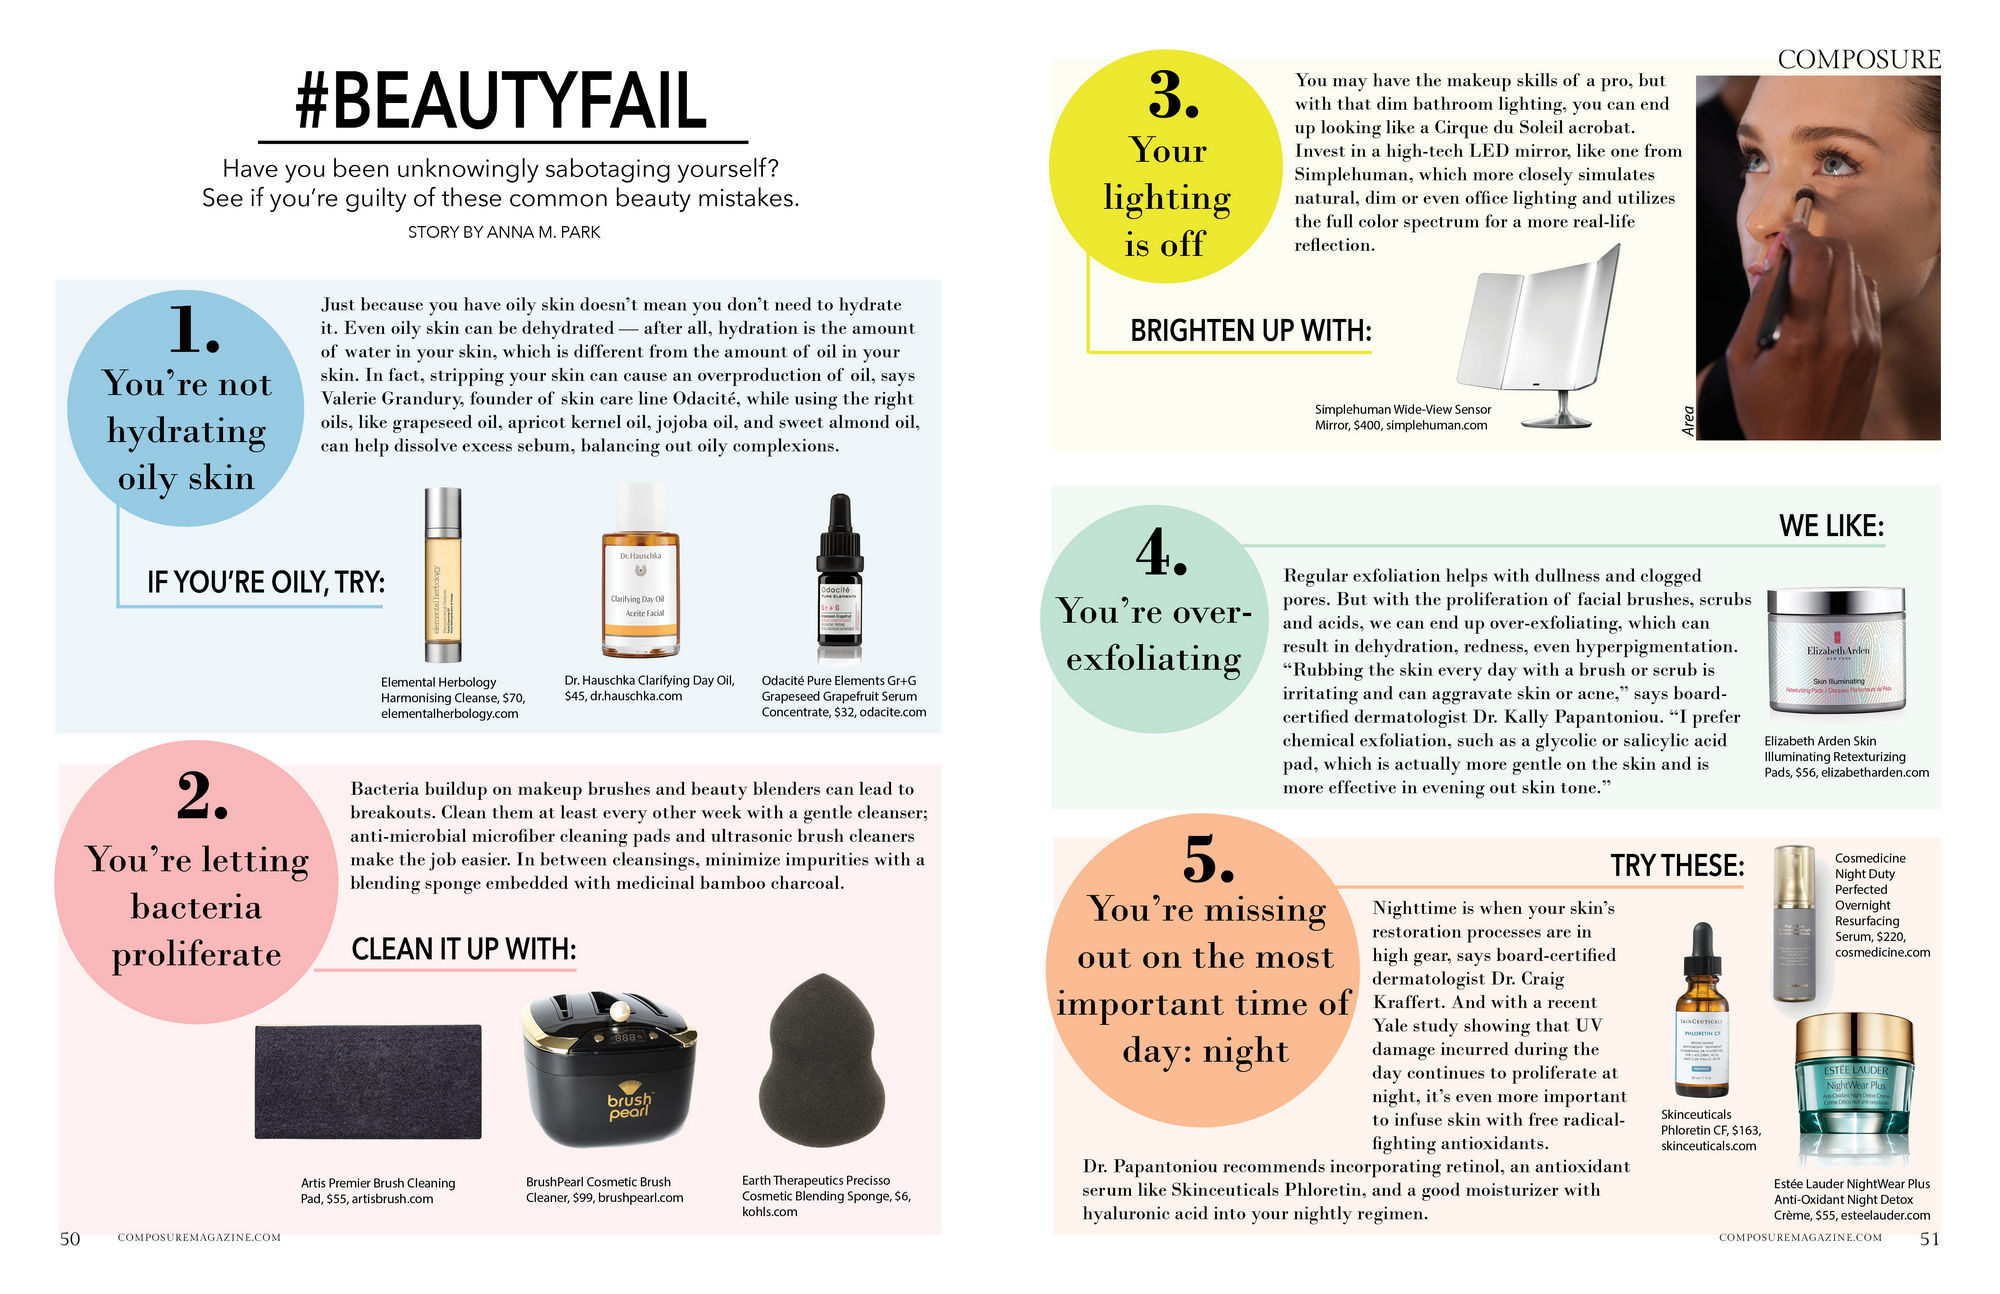 #BeautyFail